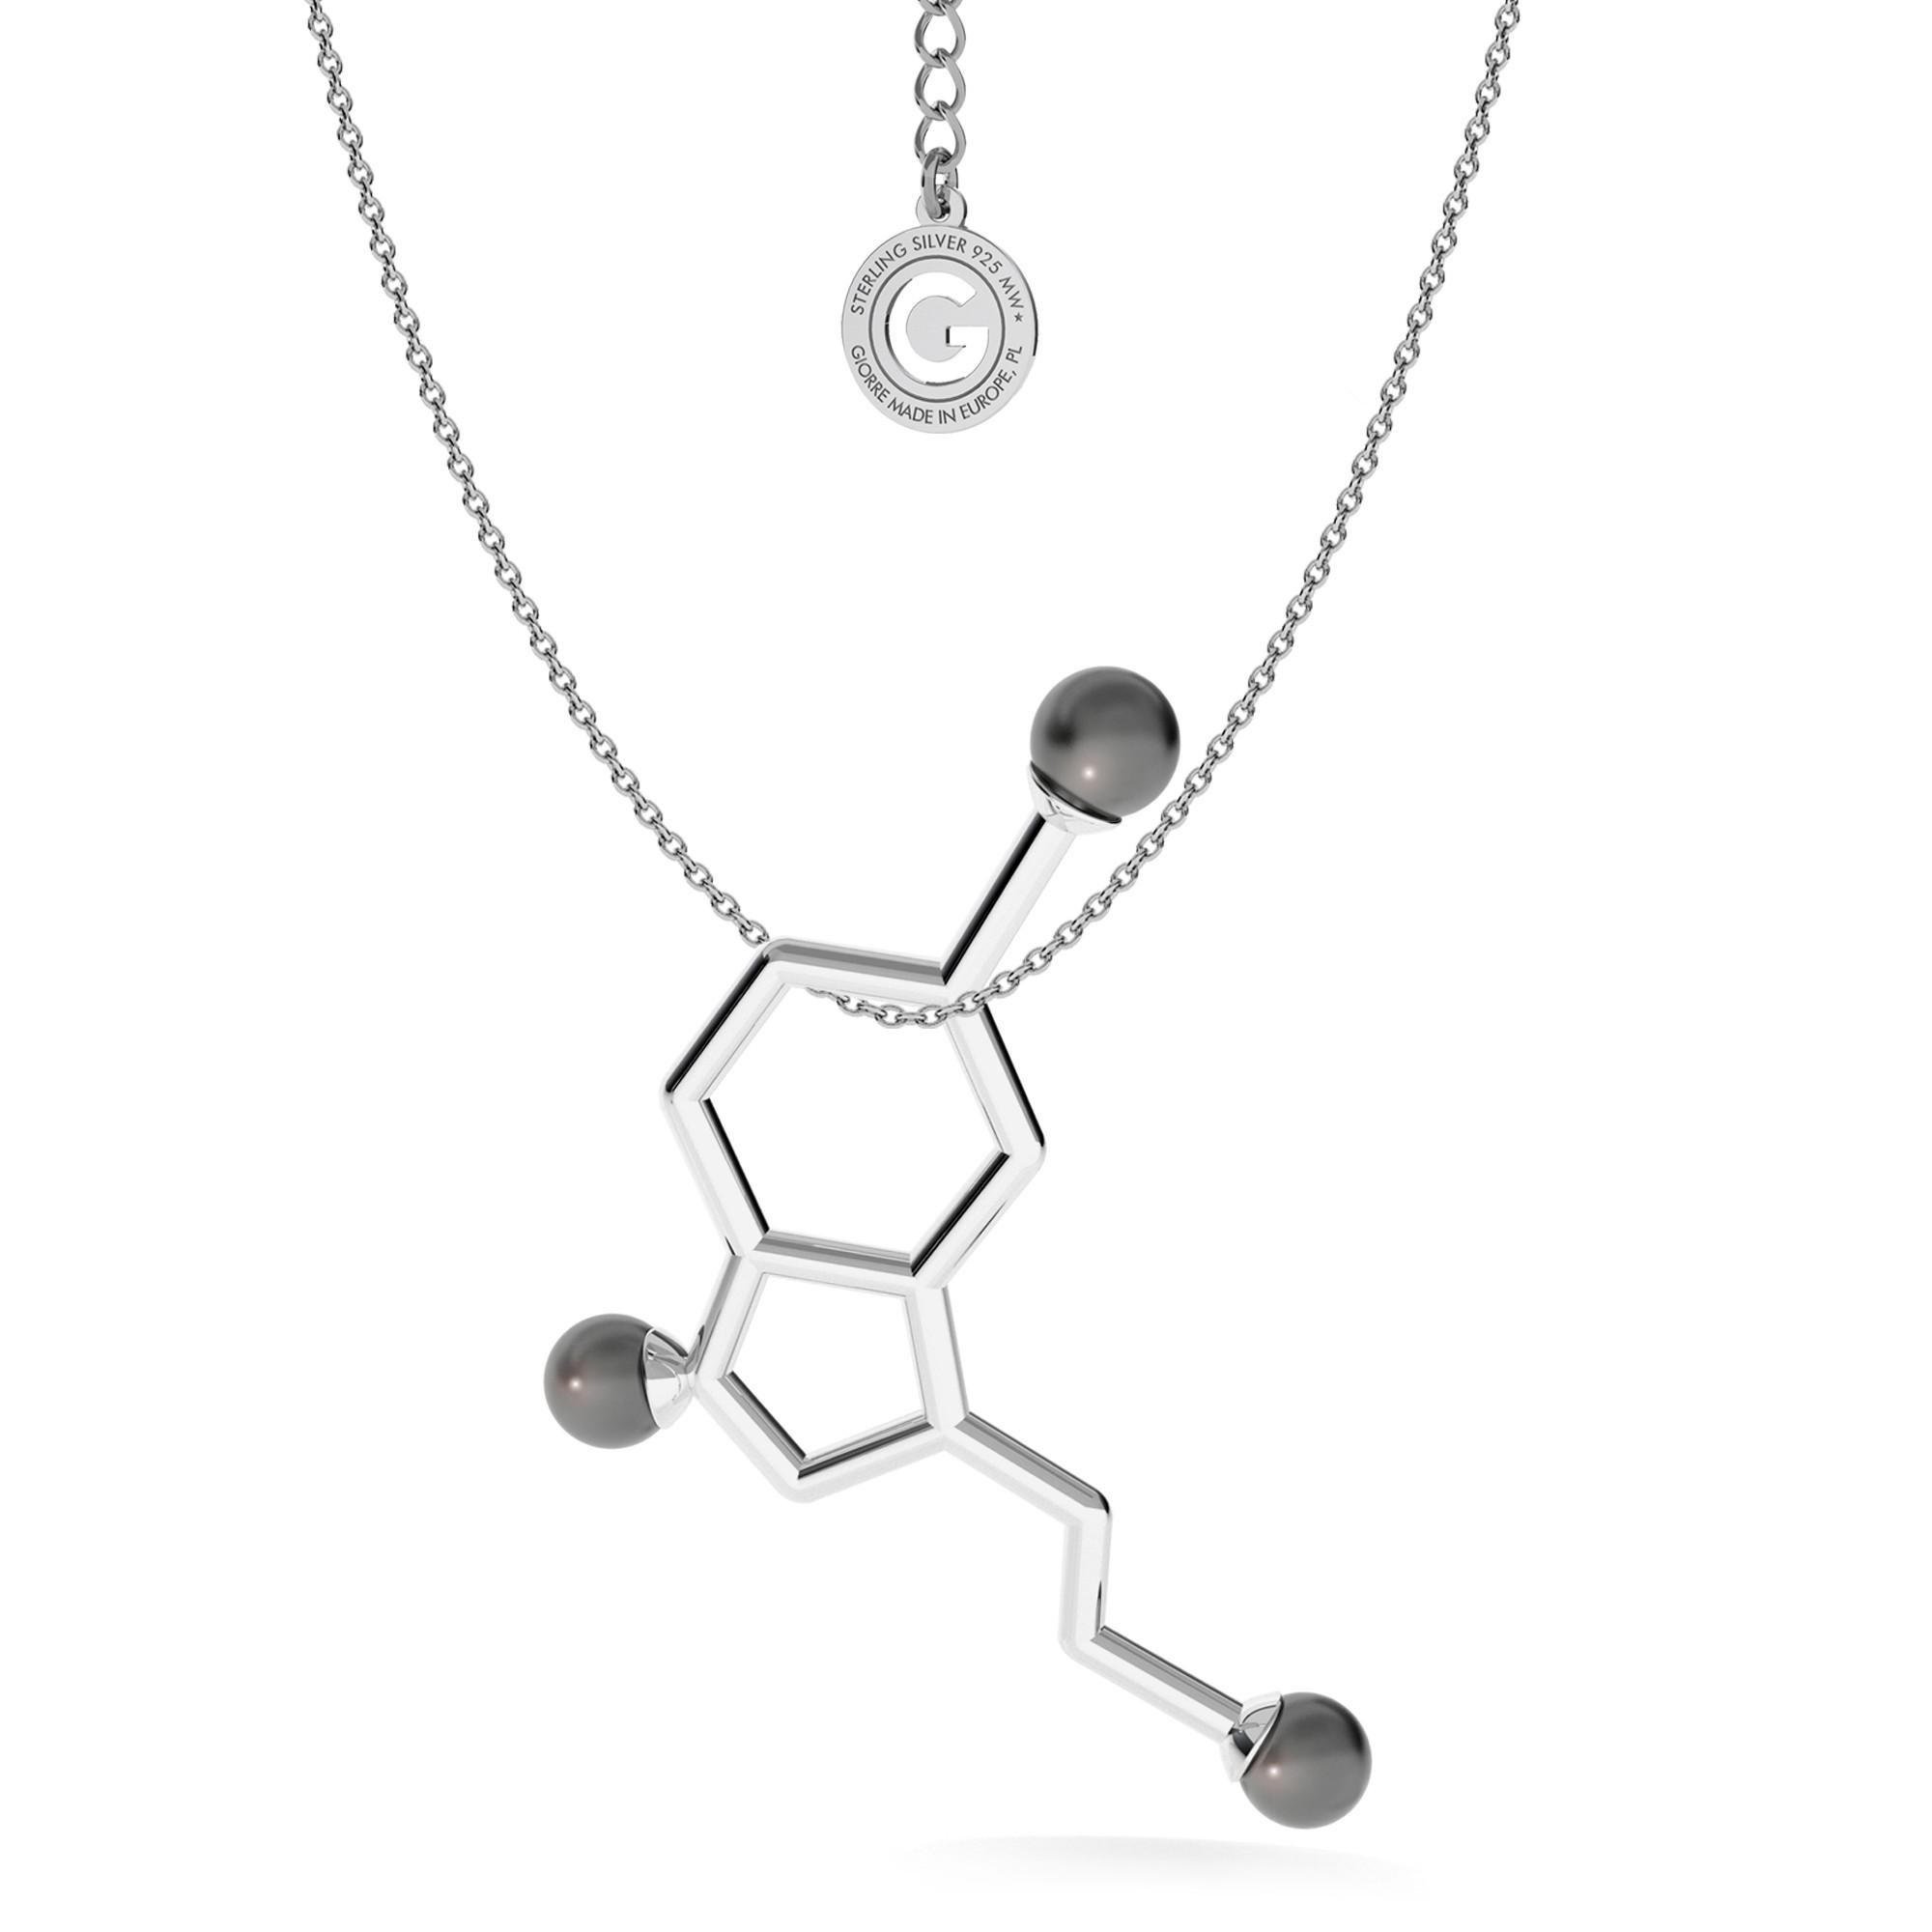 Collar serotonina fórmula química